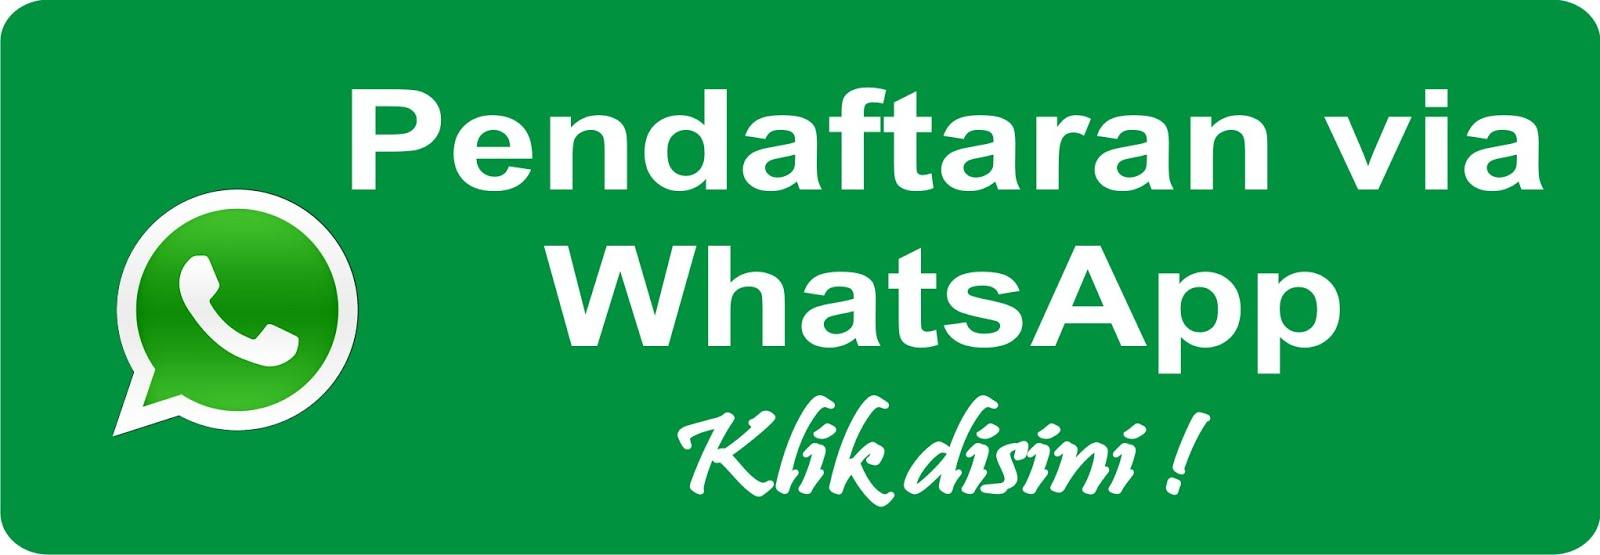 Pendaftaran via WhatsApp